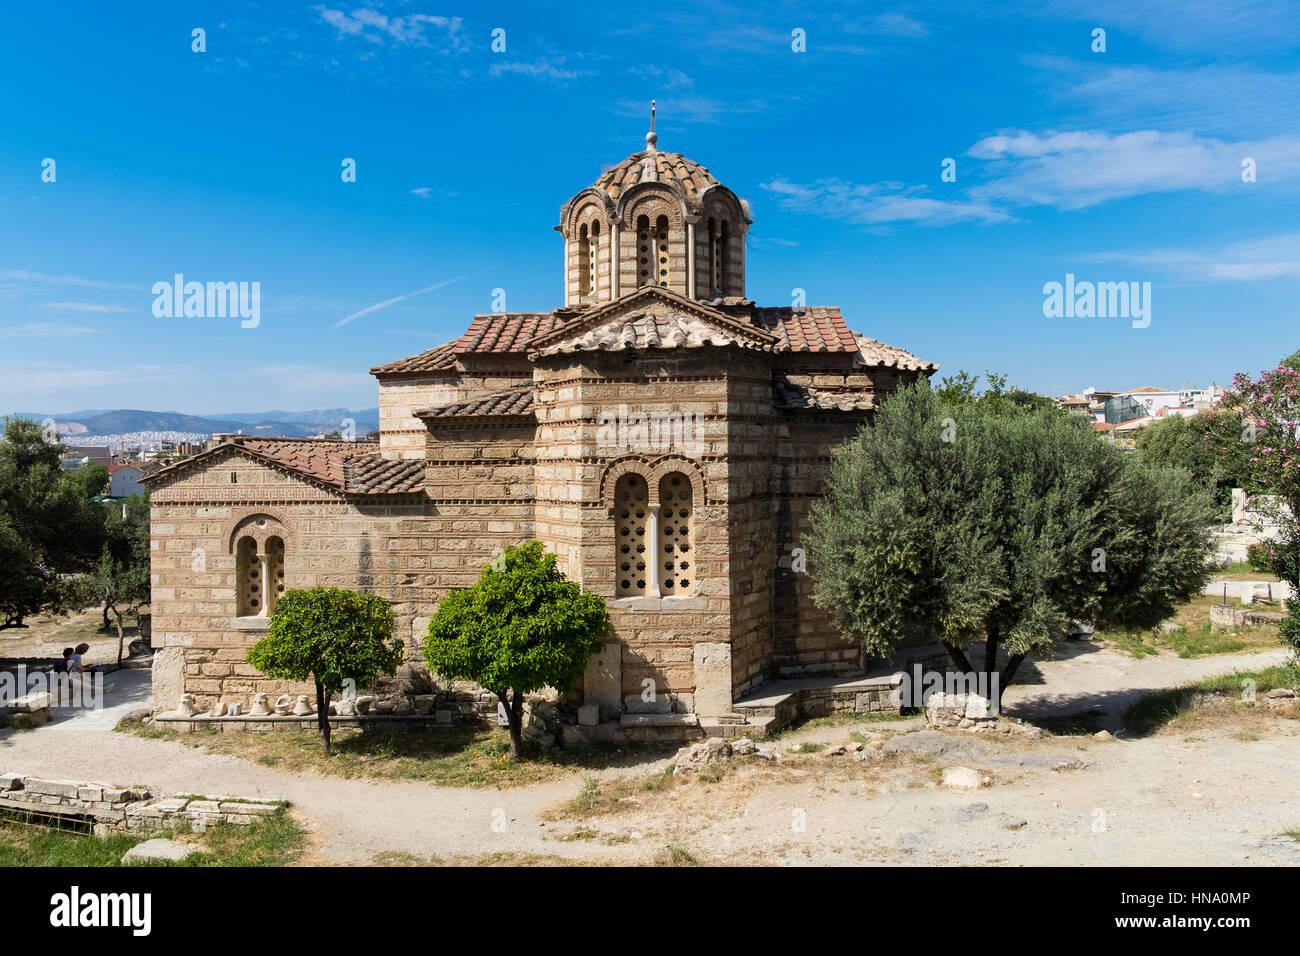 Byzantine Greek Orthodox Church, ancient Agora, Athens, Greece - Stock Image